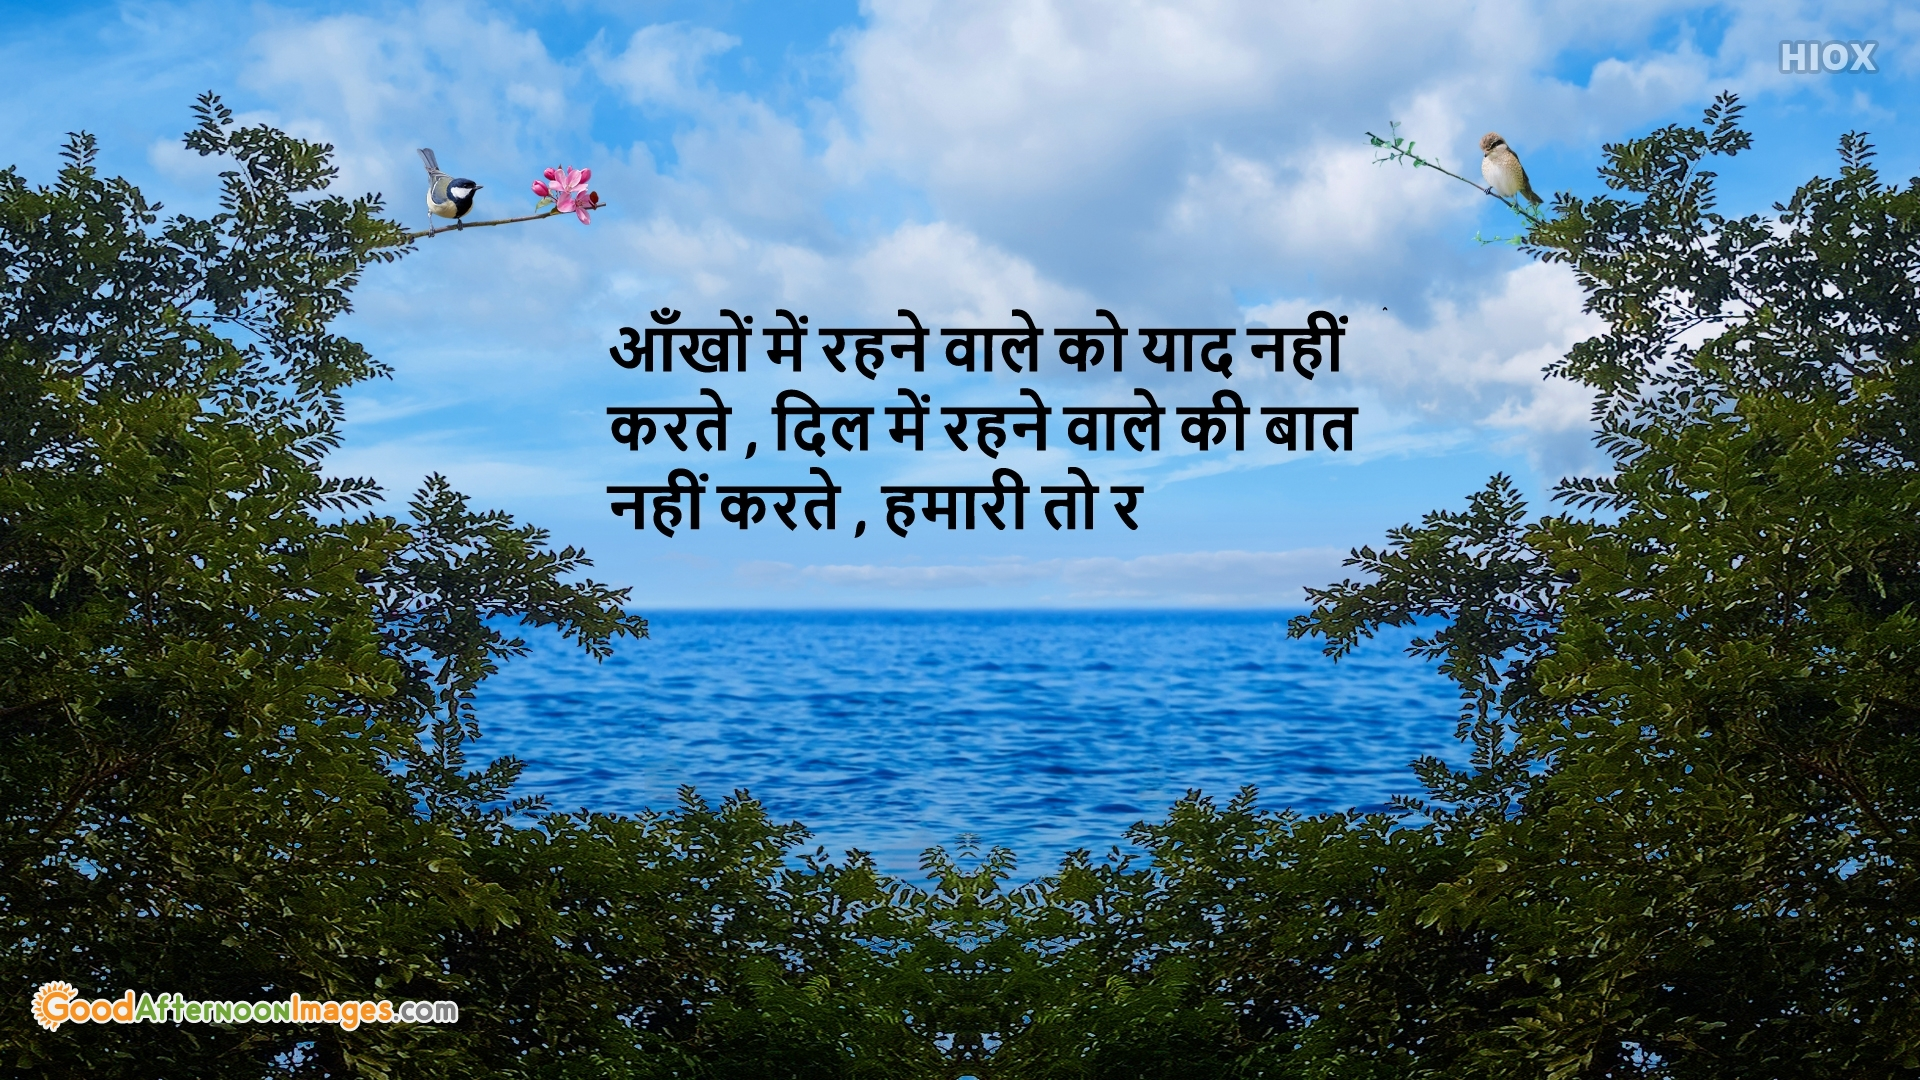 Good Afternoon Image With Shayari